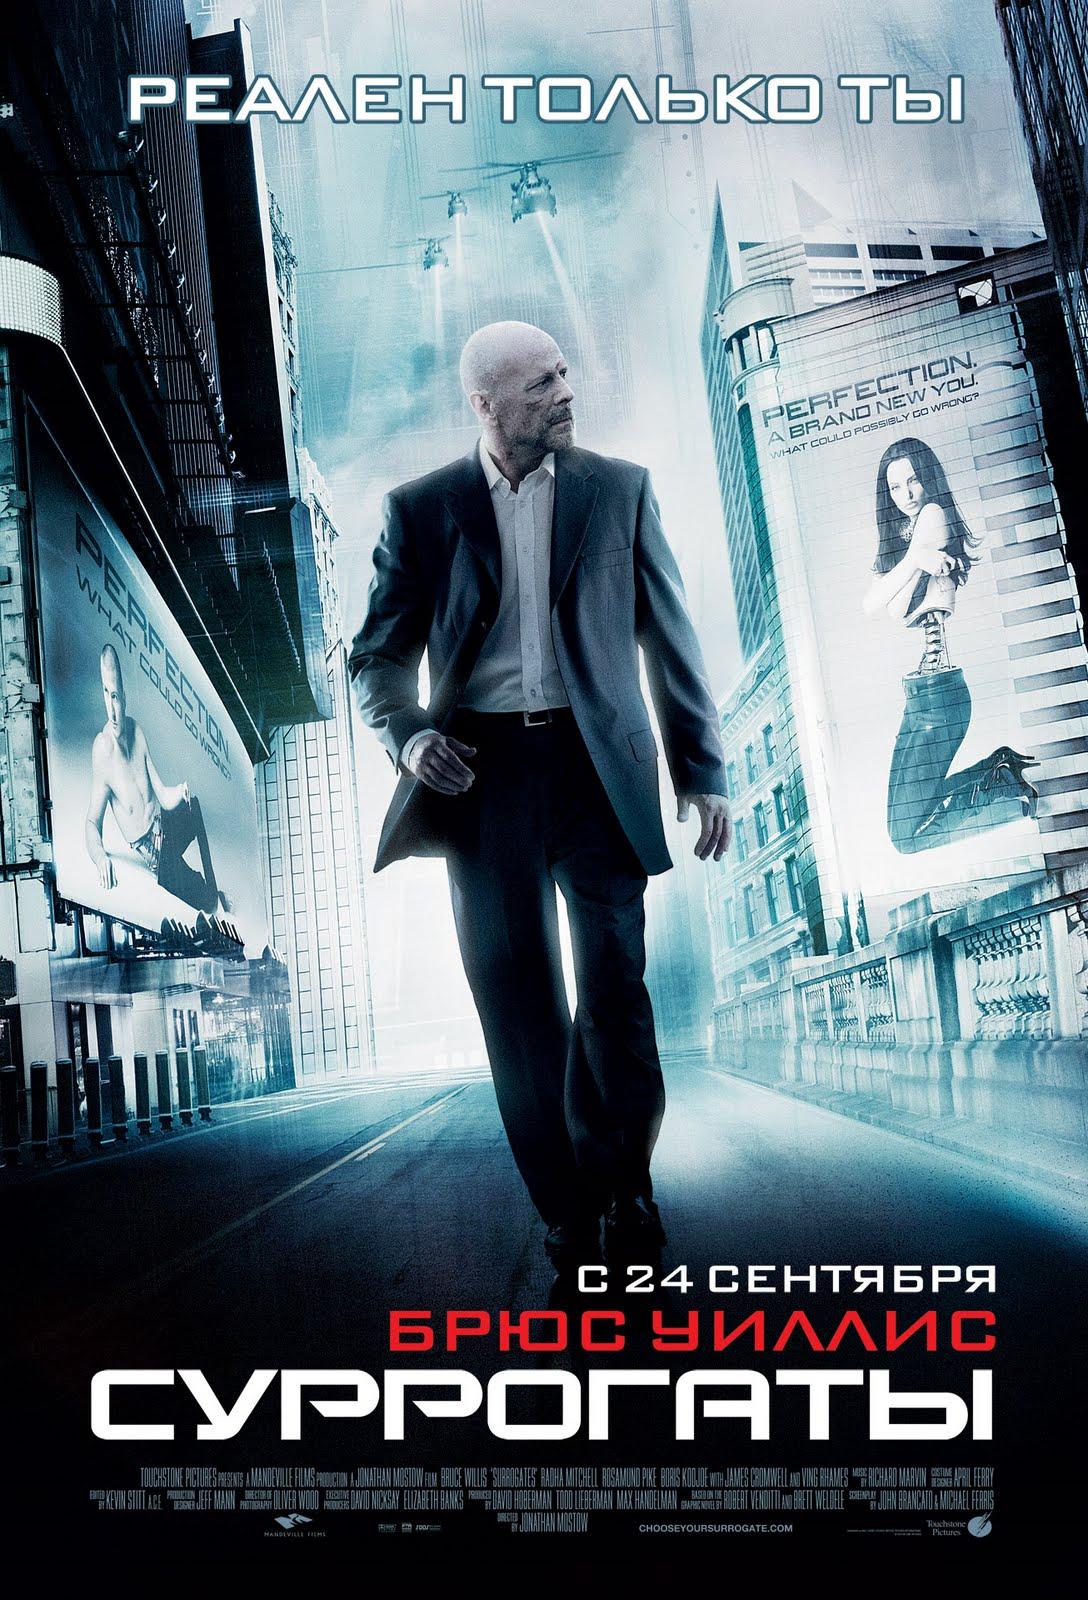 http://3.bp.blogspot.com/-7Uzqzp7mm_c/Tef318v-YBI/AAAAAAAAAaU/NDG-nsvBMgo/s1600/Surrogates+Bruce+Willis+Movie+Poster.jpg